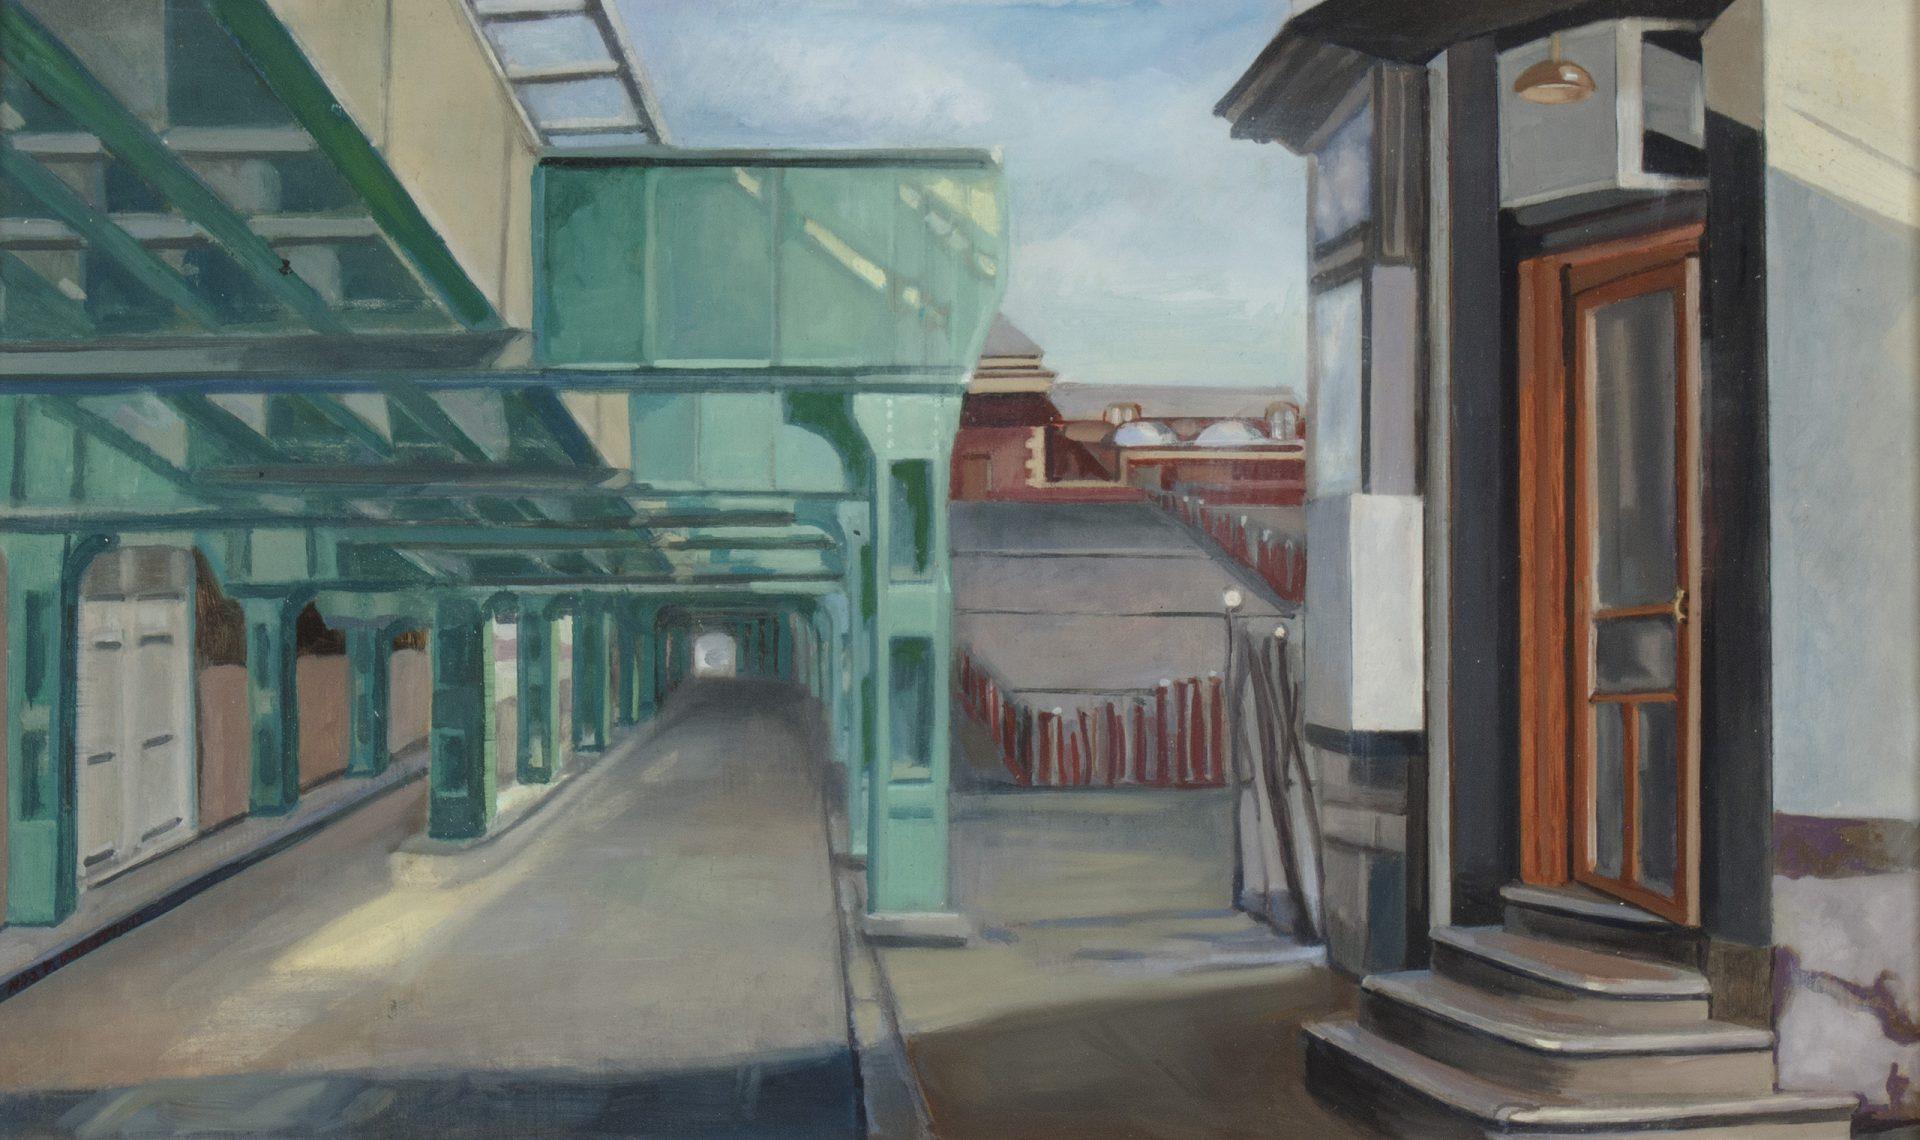 Manayunk Station (Nina F. Martino)